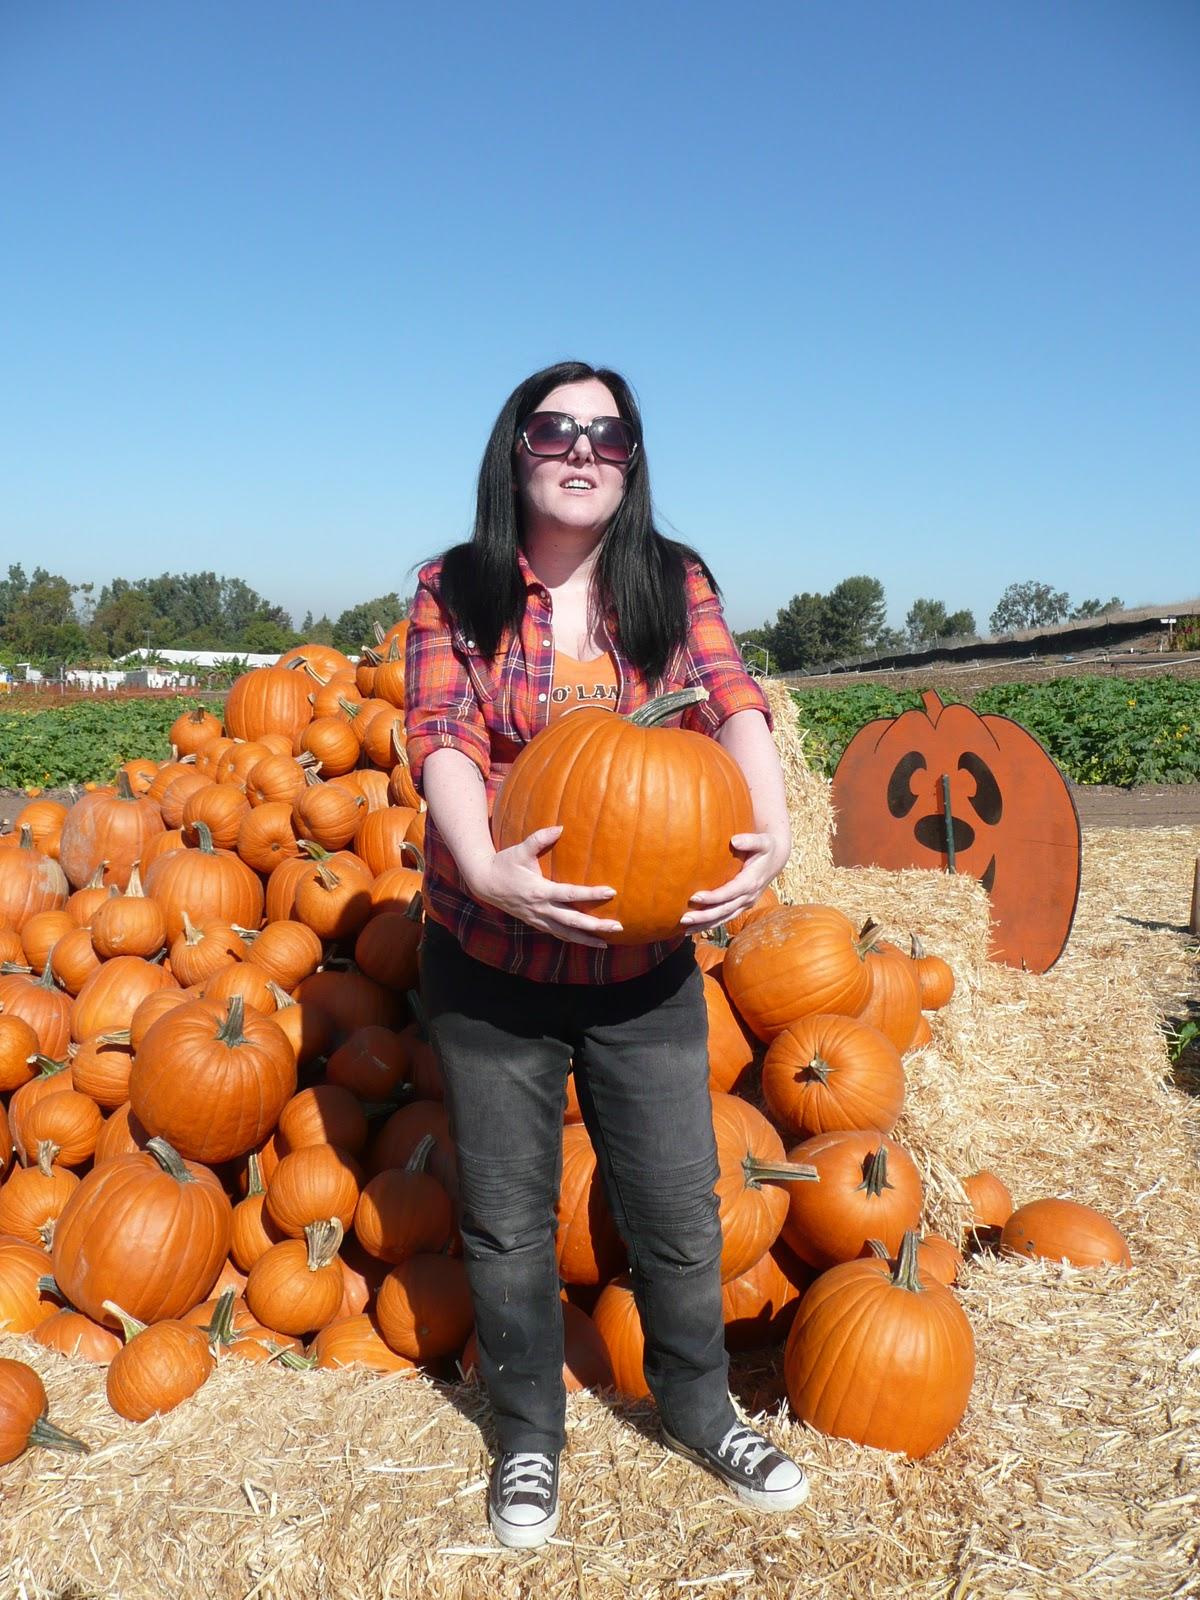 The Spooky Vegan: 31 Days of Halloween: Pumpkin Patch Visit